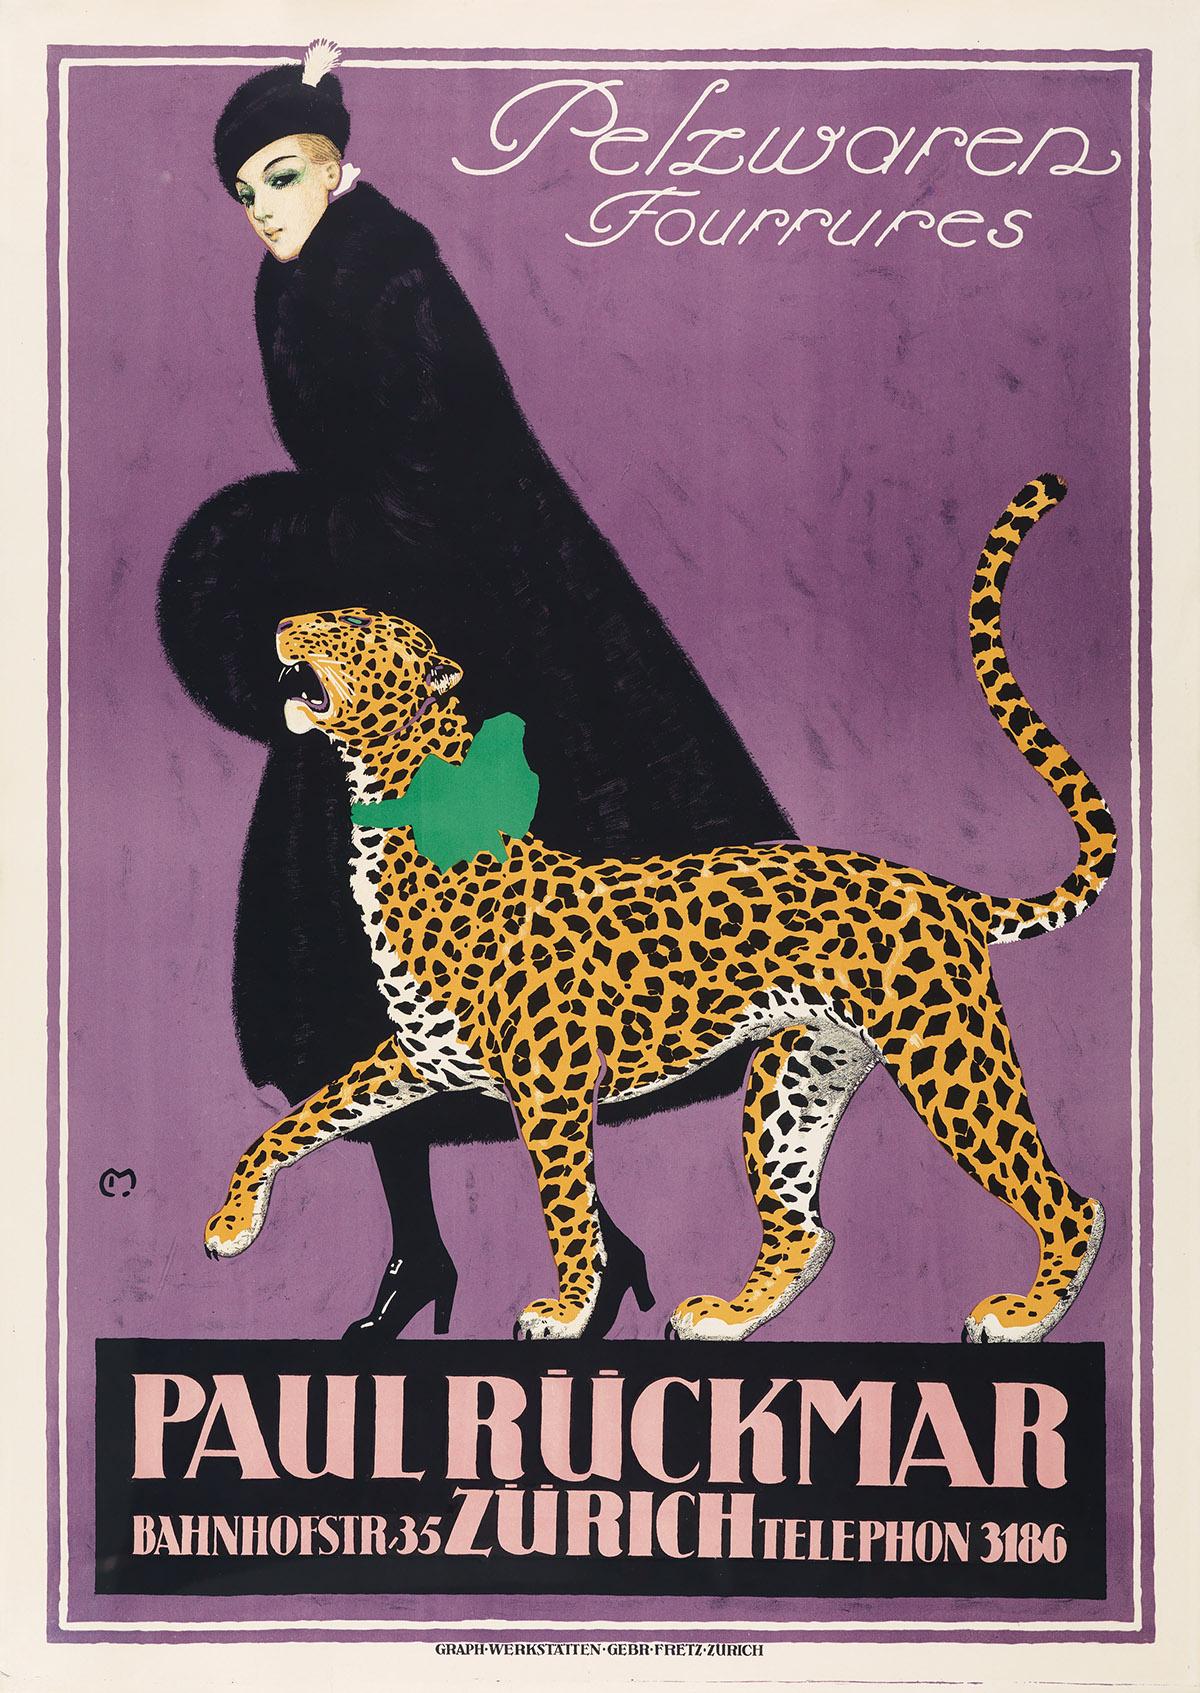 CARL FRANZ MOOS (1878-1959). PAUL RÜCKMAR / ZÜRICH. 1924. 50x35 inches, 127x90 cm. Gebr. Fretz, Zurich.